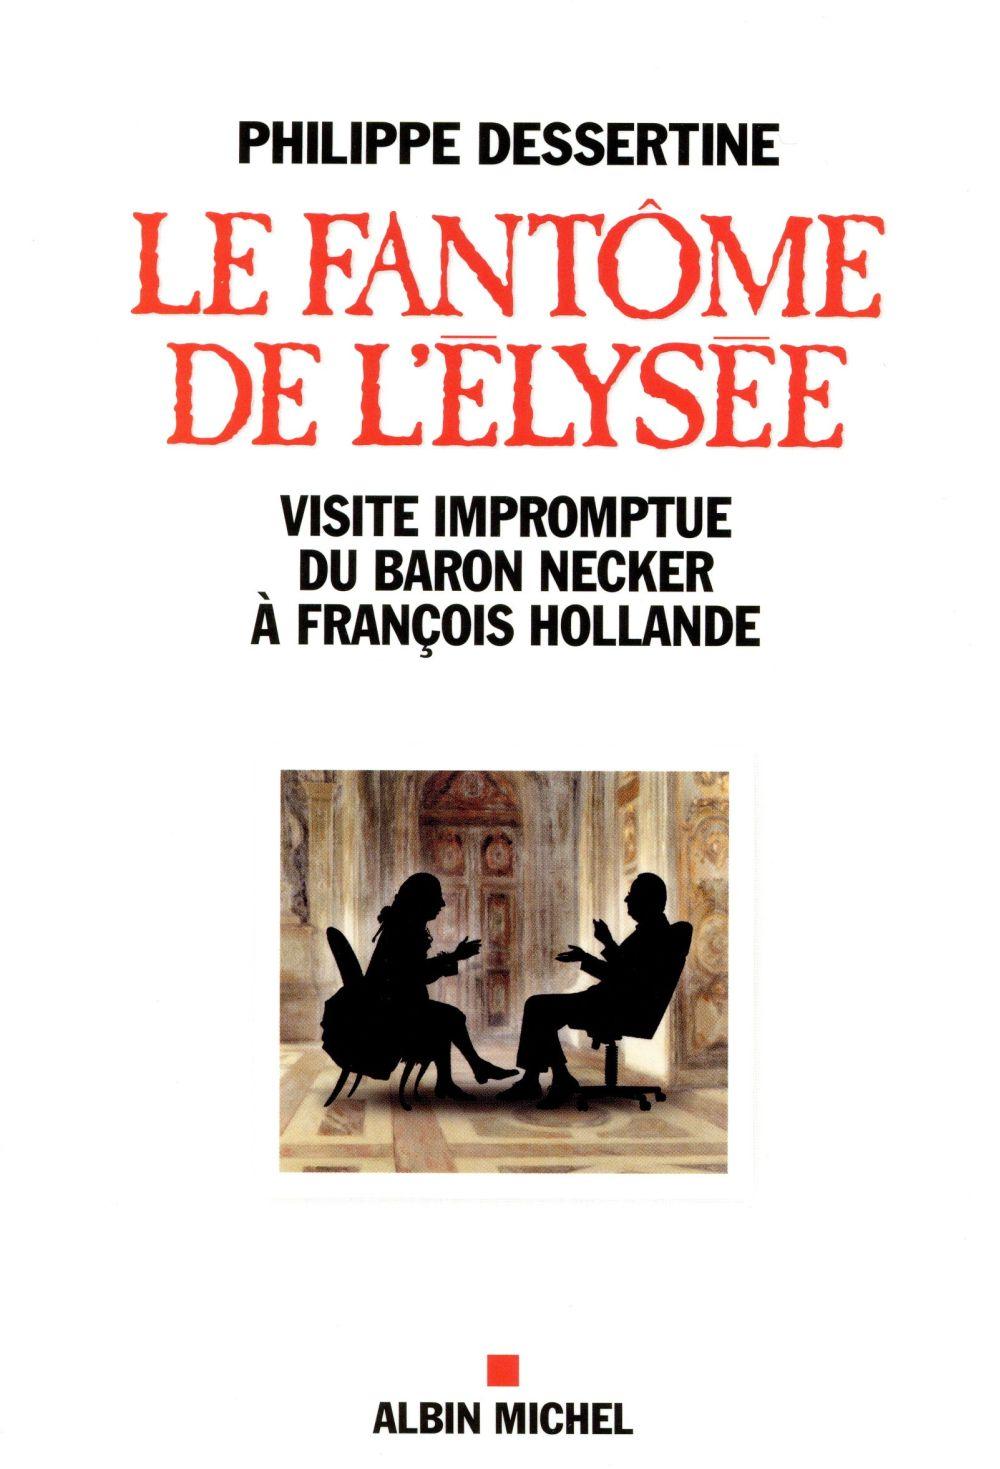 LE FANTOME DE L'ELYSEE - VISITE IMPROMPTUE DU BARON NECKER A FRANCOIS HOLLANDE